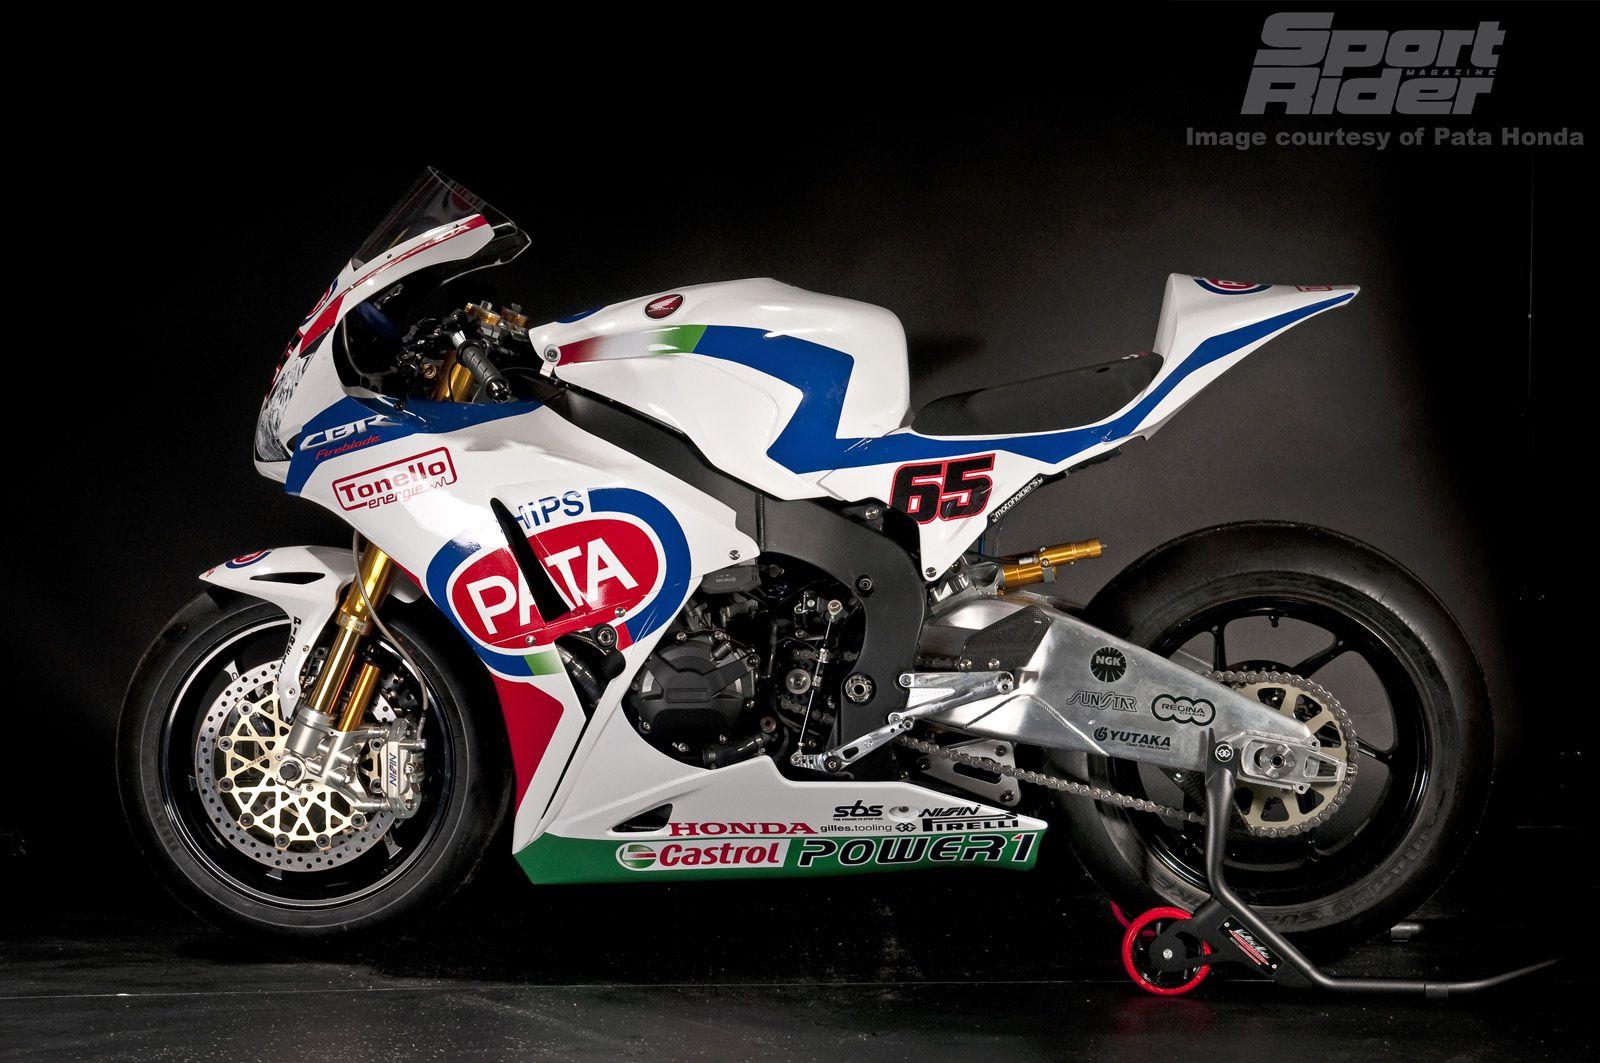 2013 Pata Honda World Superbike Team Wallpaper Team Wallpaper Honda Honda Motorcycles